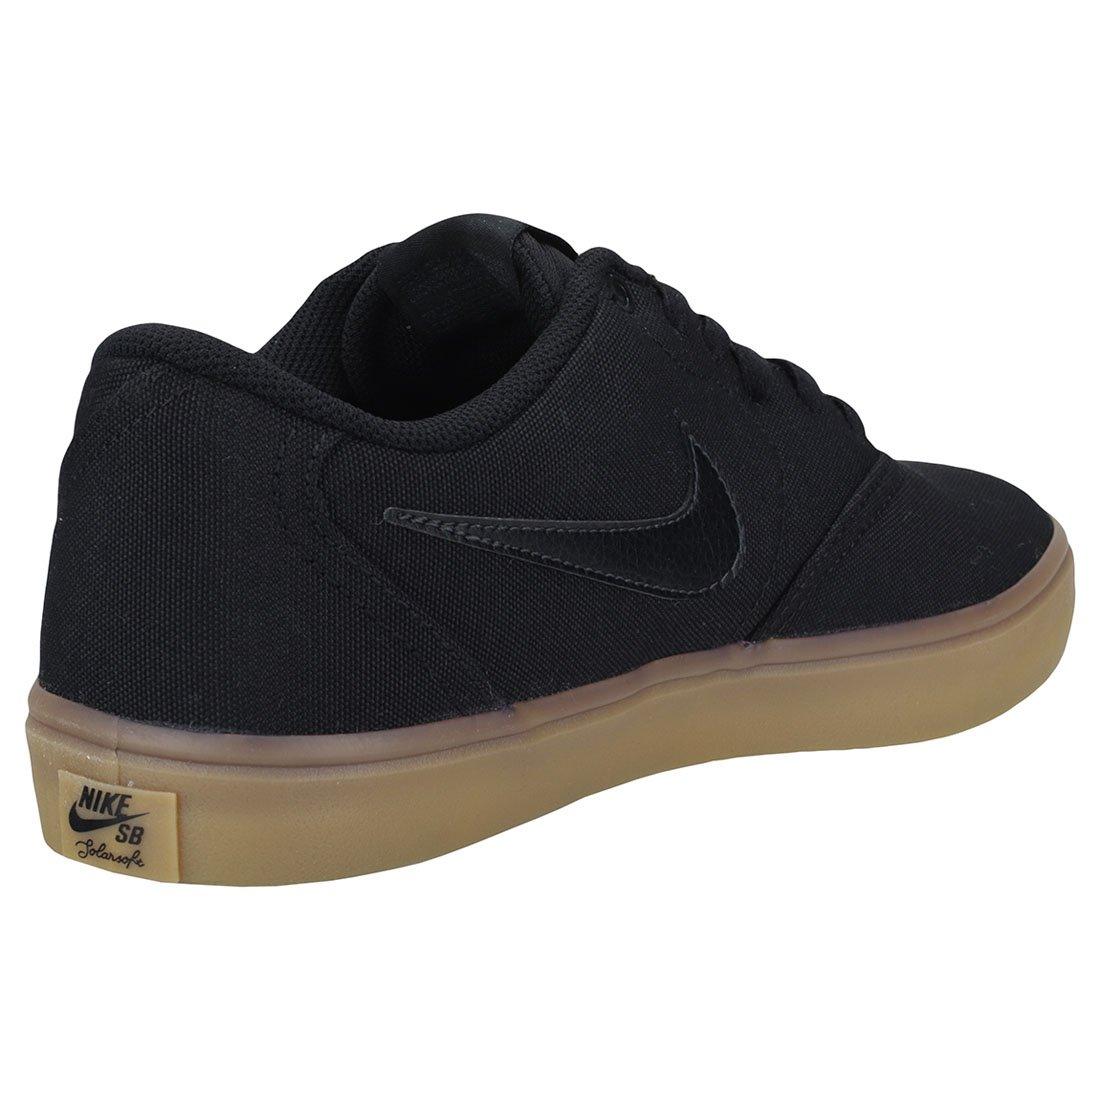 Nike Men's SB Check Solarsoft Canvas Skateboarding Shoes Black/Black-Gum Light Brown 10 by Nike (Image #2)